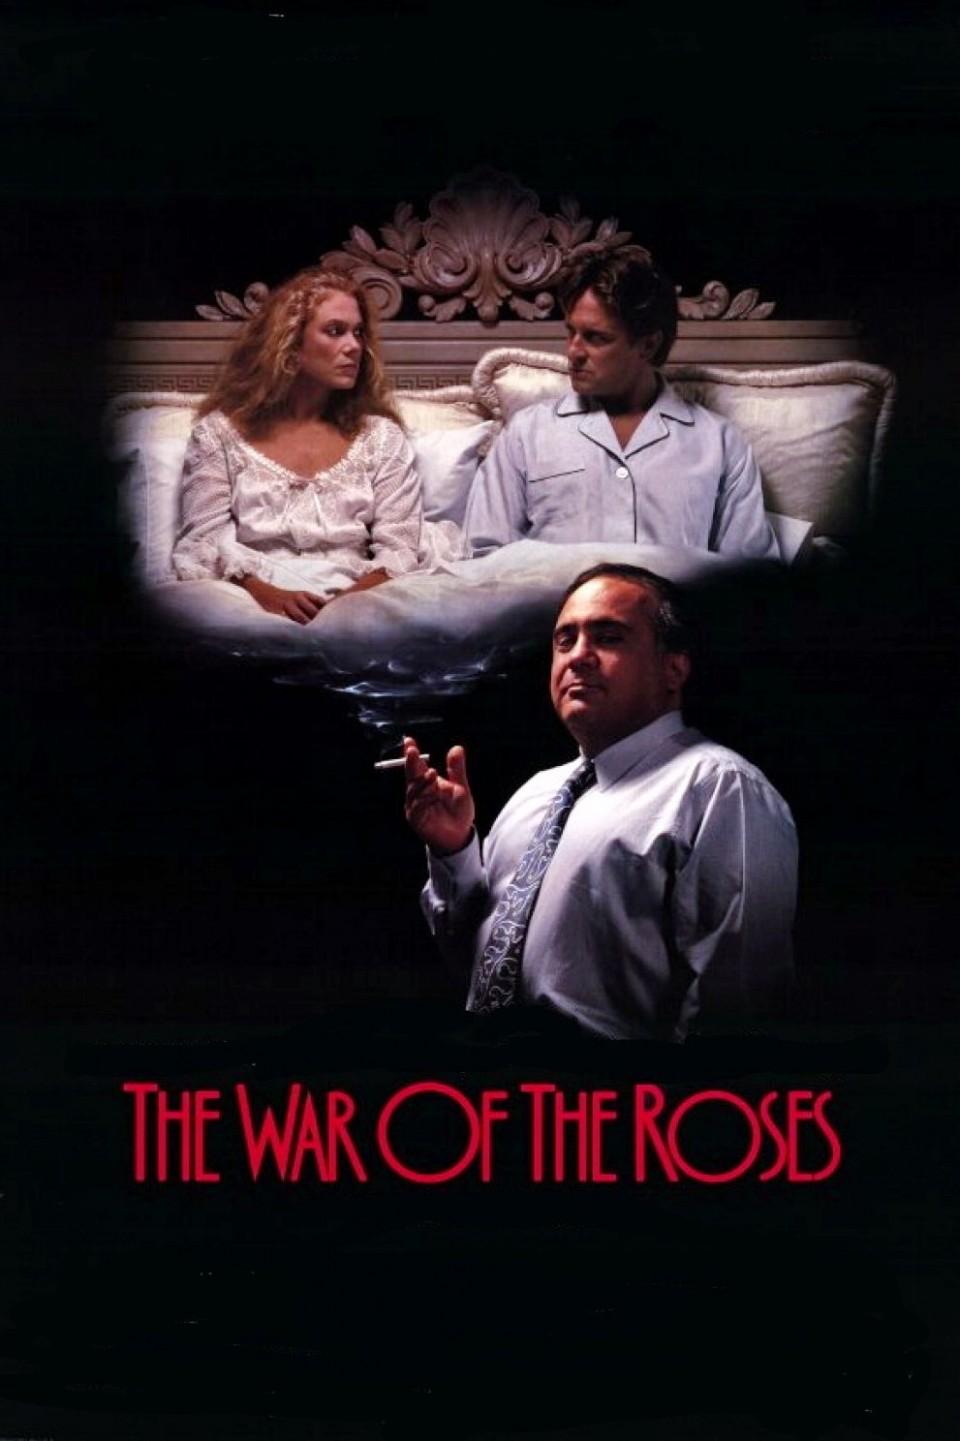 La Guerra dei Roses